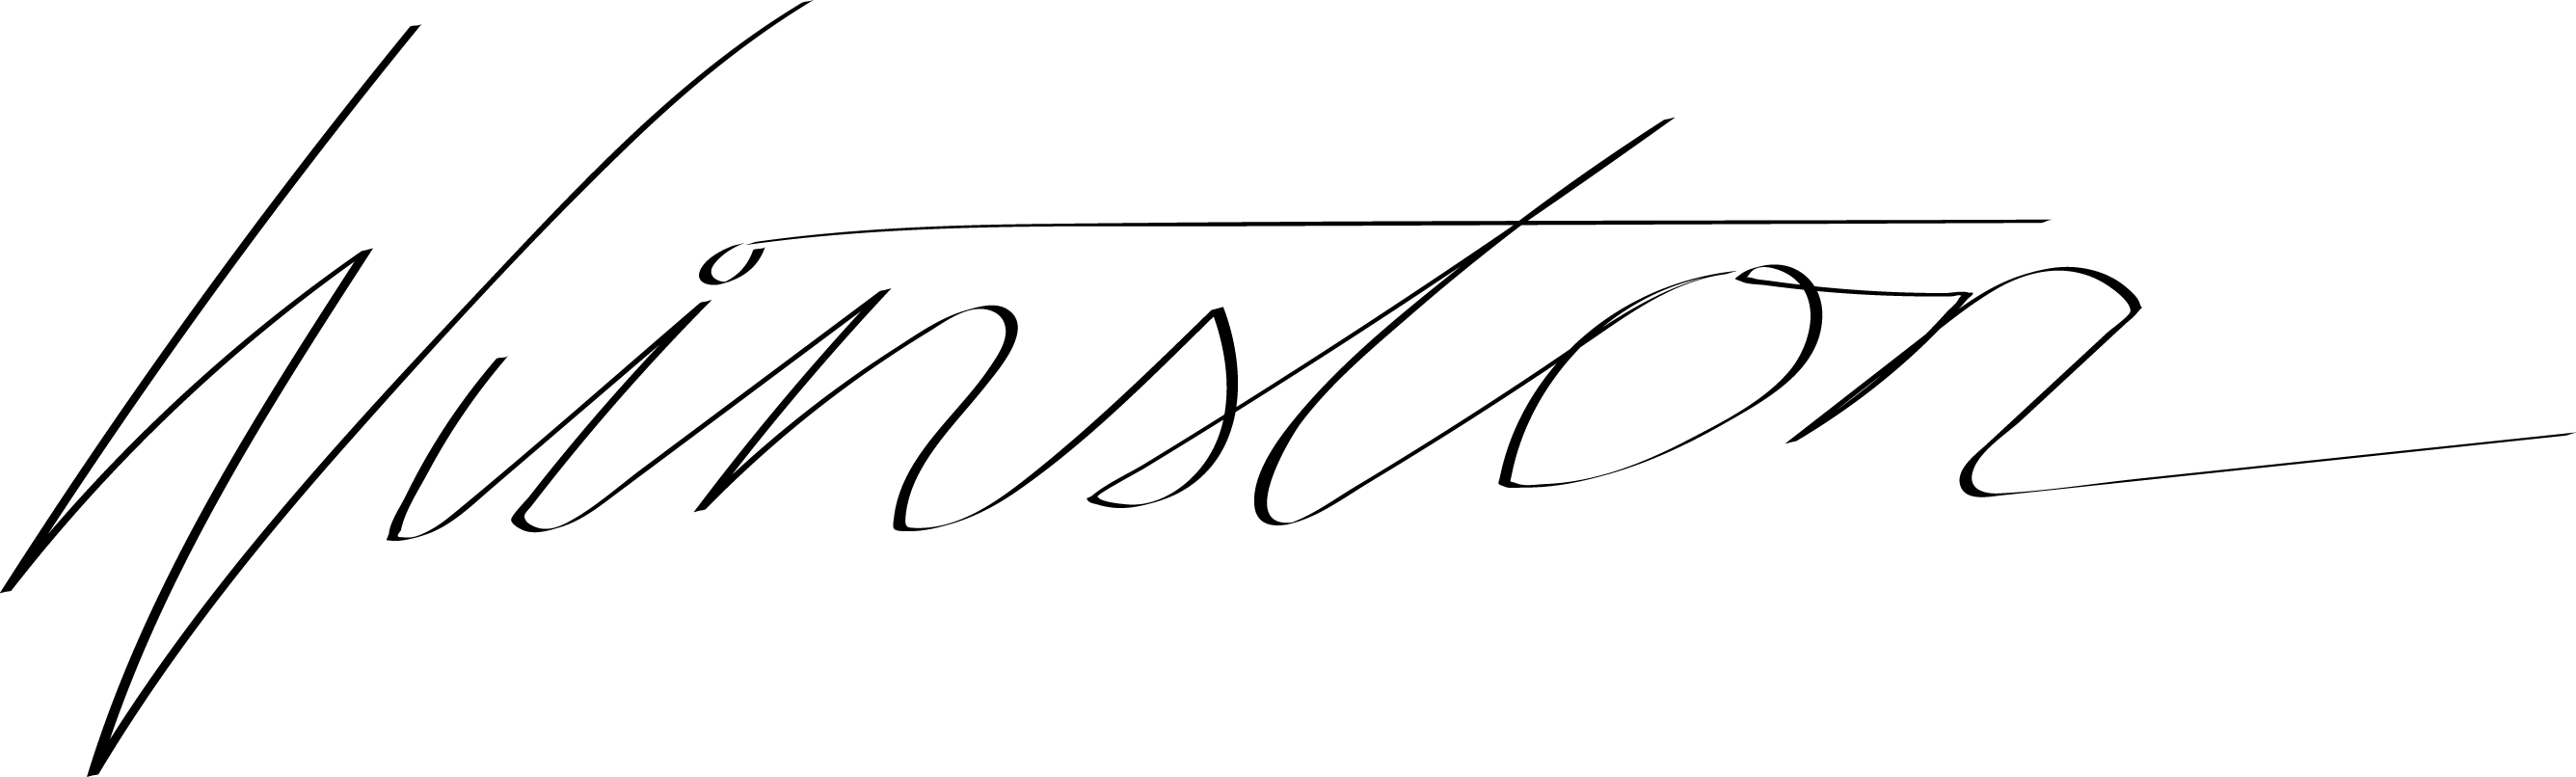 Winston Brinkerhoff's Signature